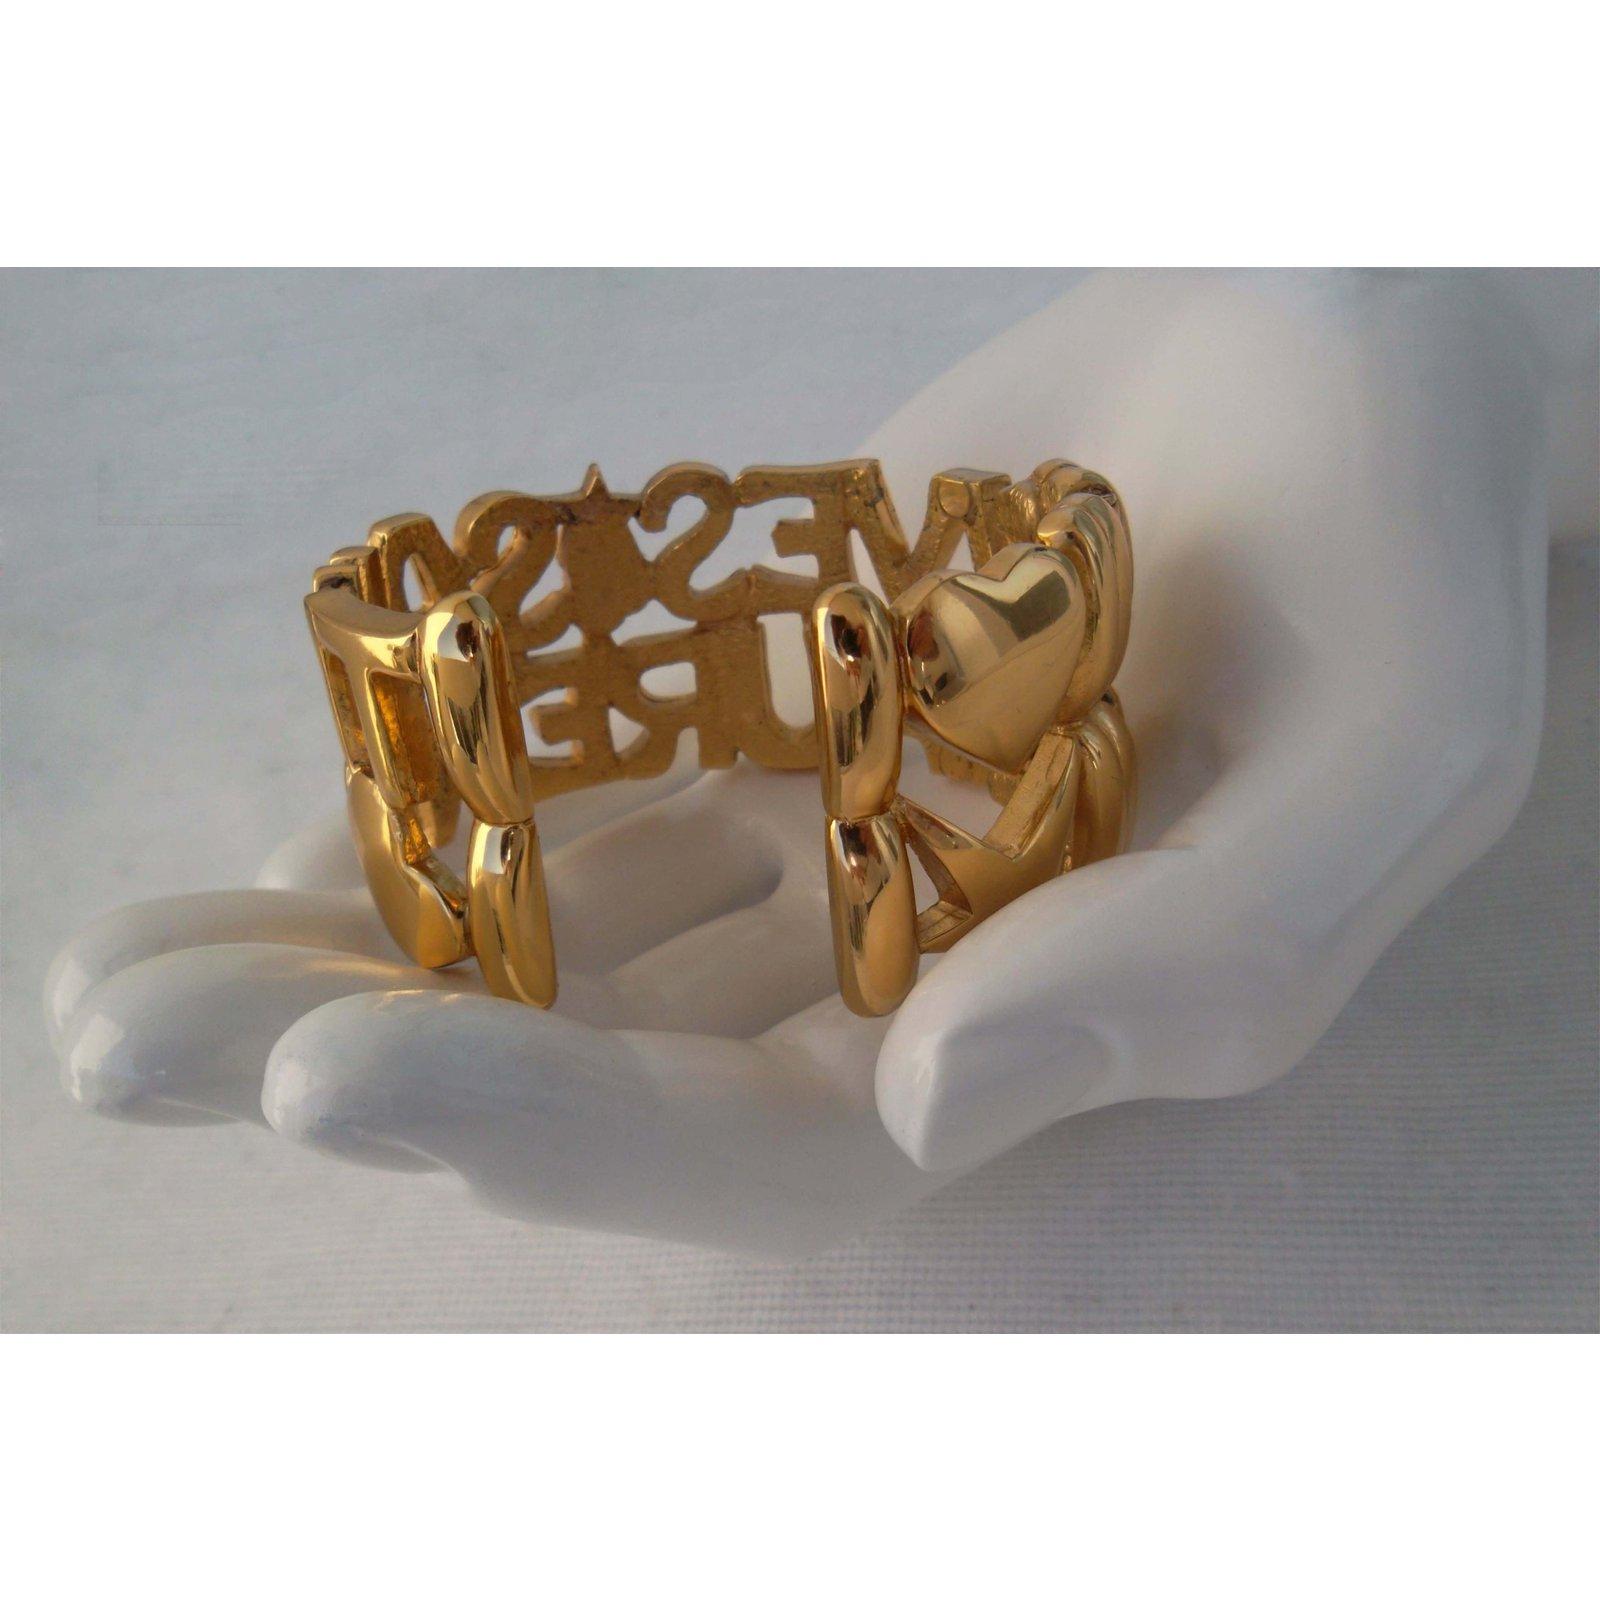 63858d59412 Yves Saint Laurent LOGO CUFF Bracelets Gold-plated Golden ref.84773 - Joli  Closet